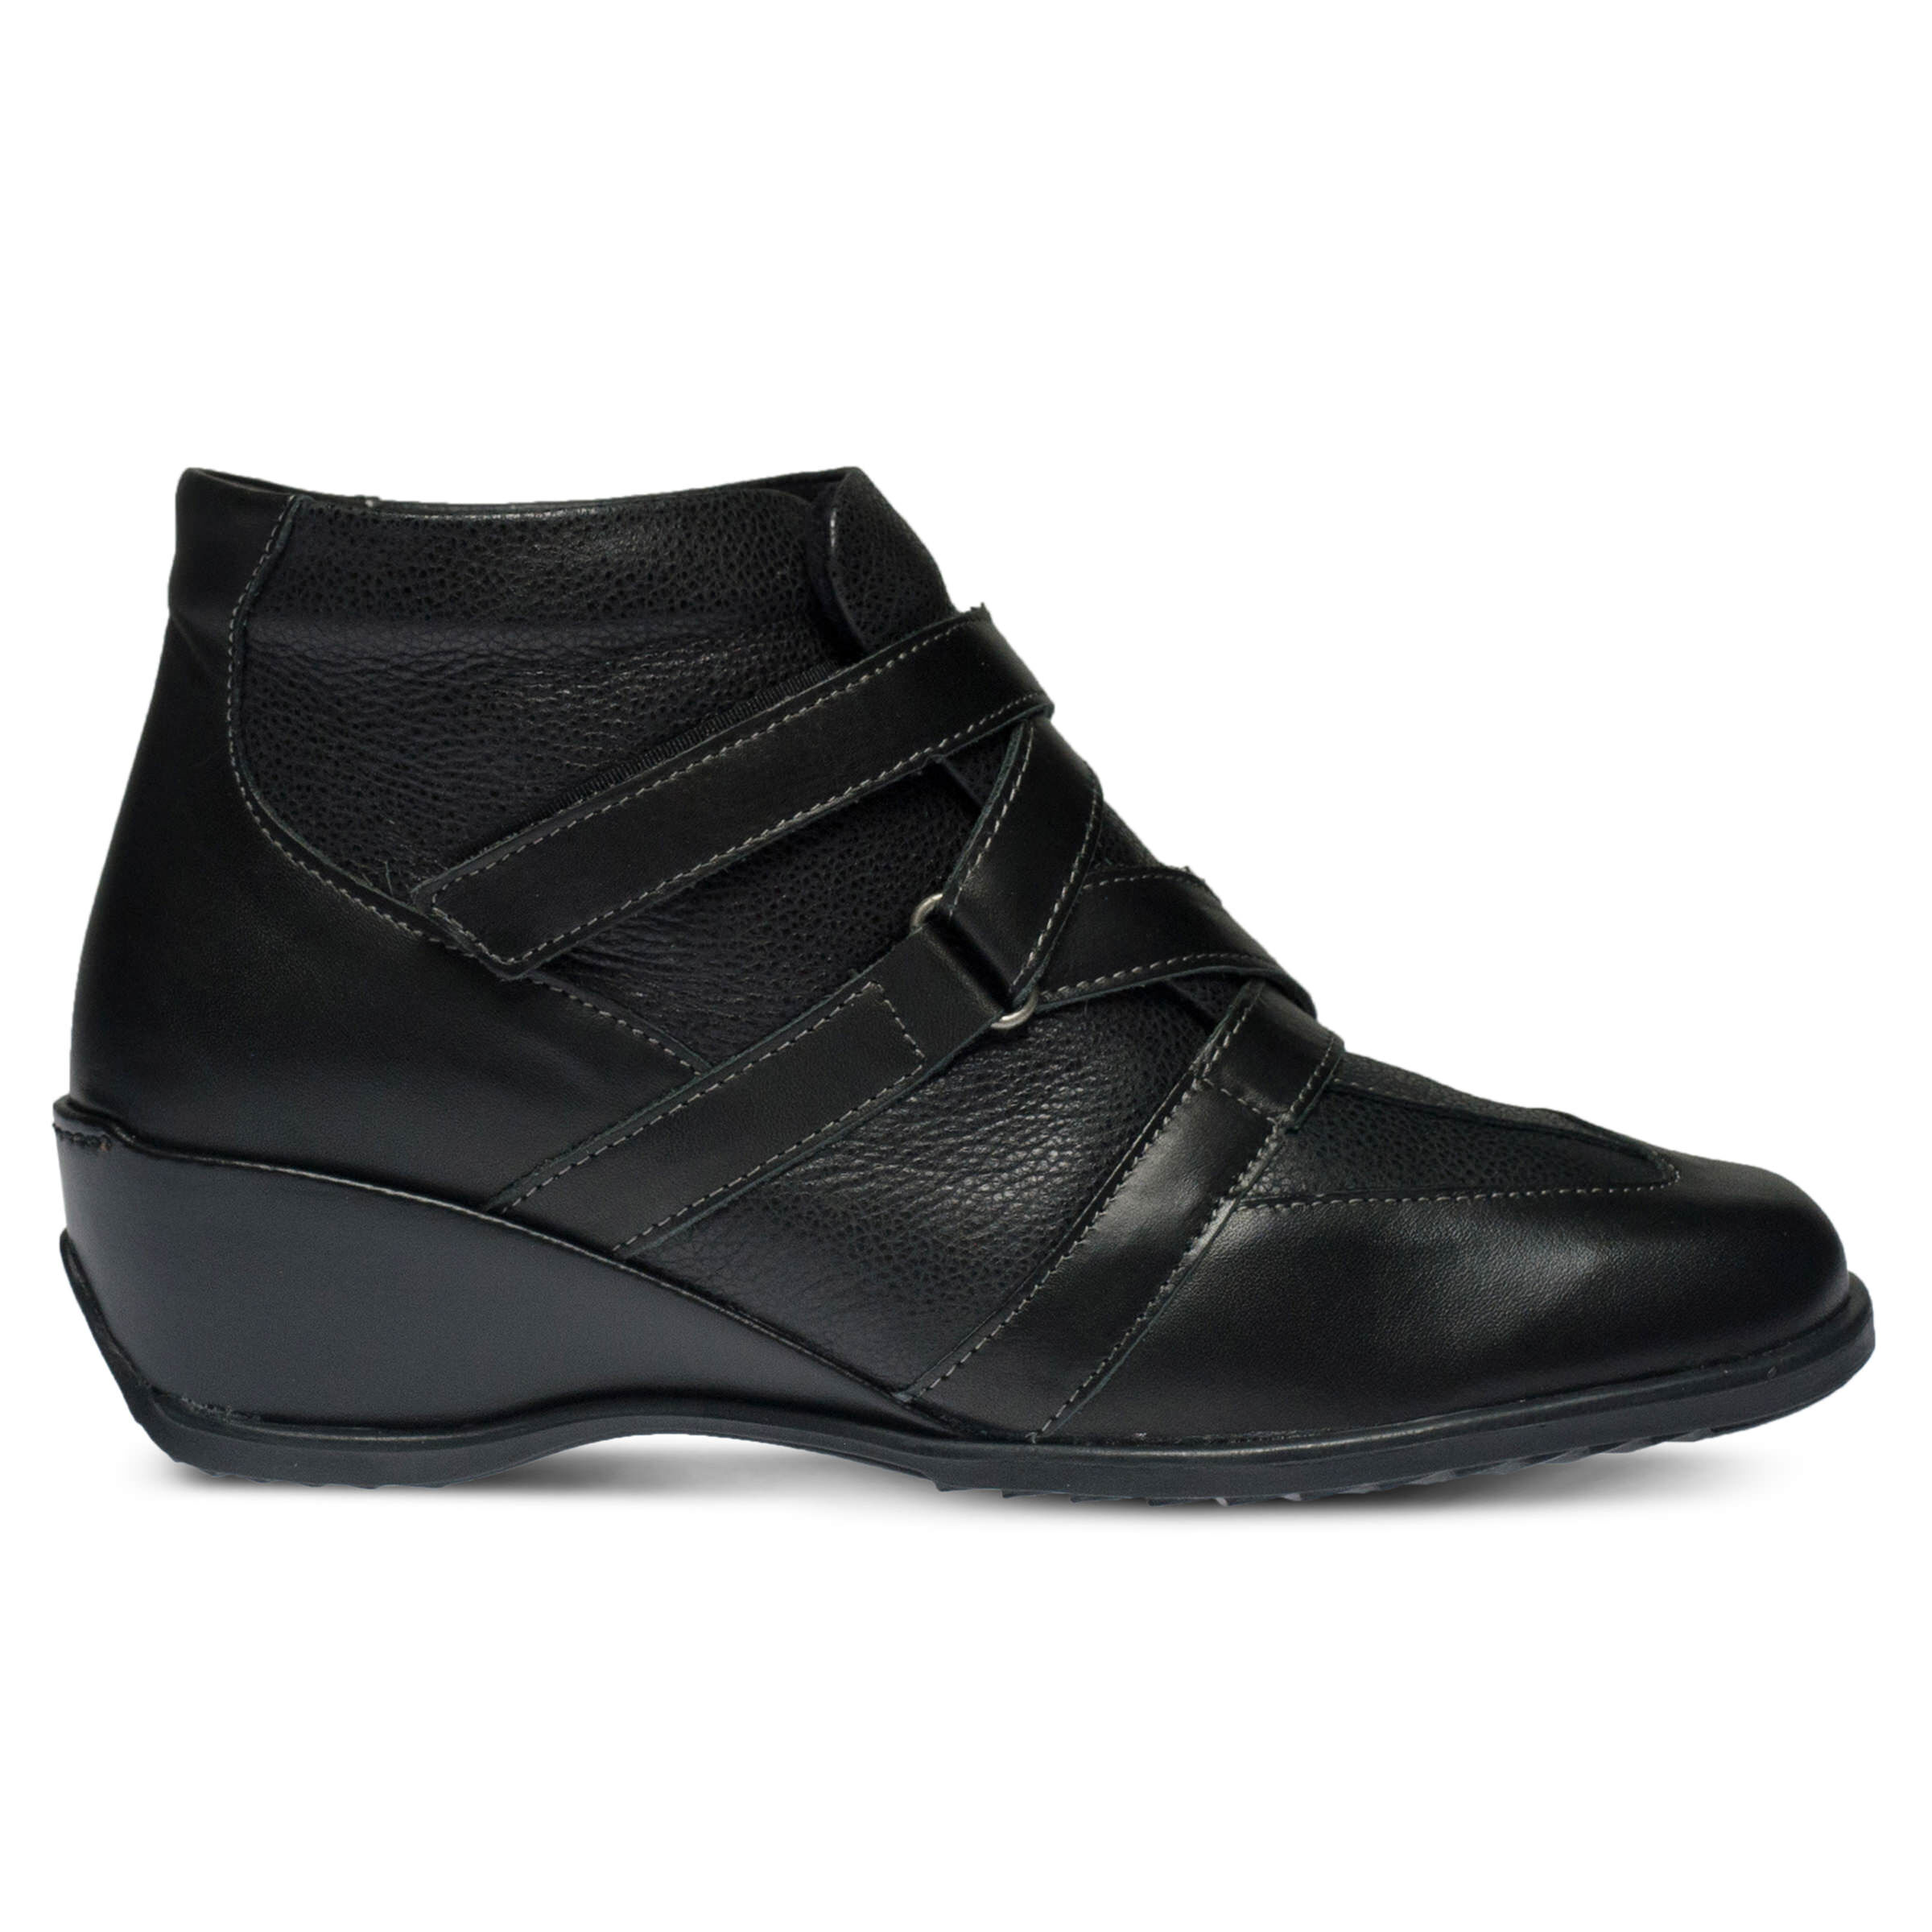 Women's SPRING STEP Allegra Booties Black